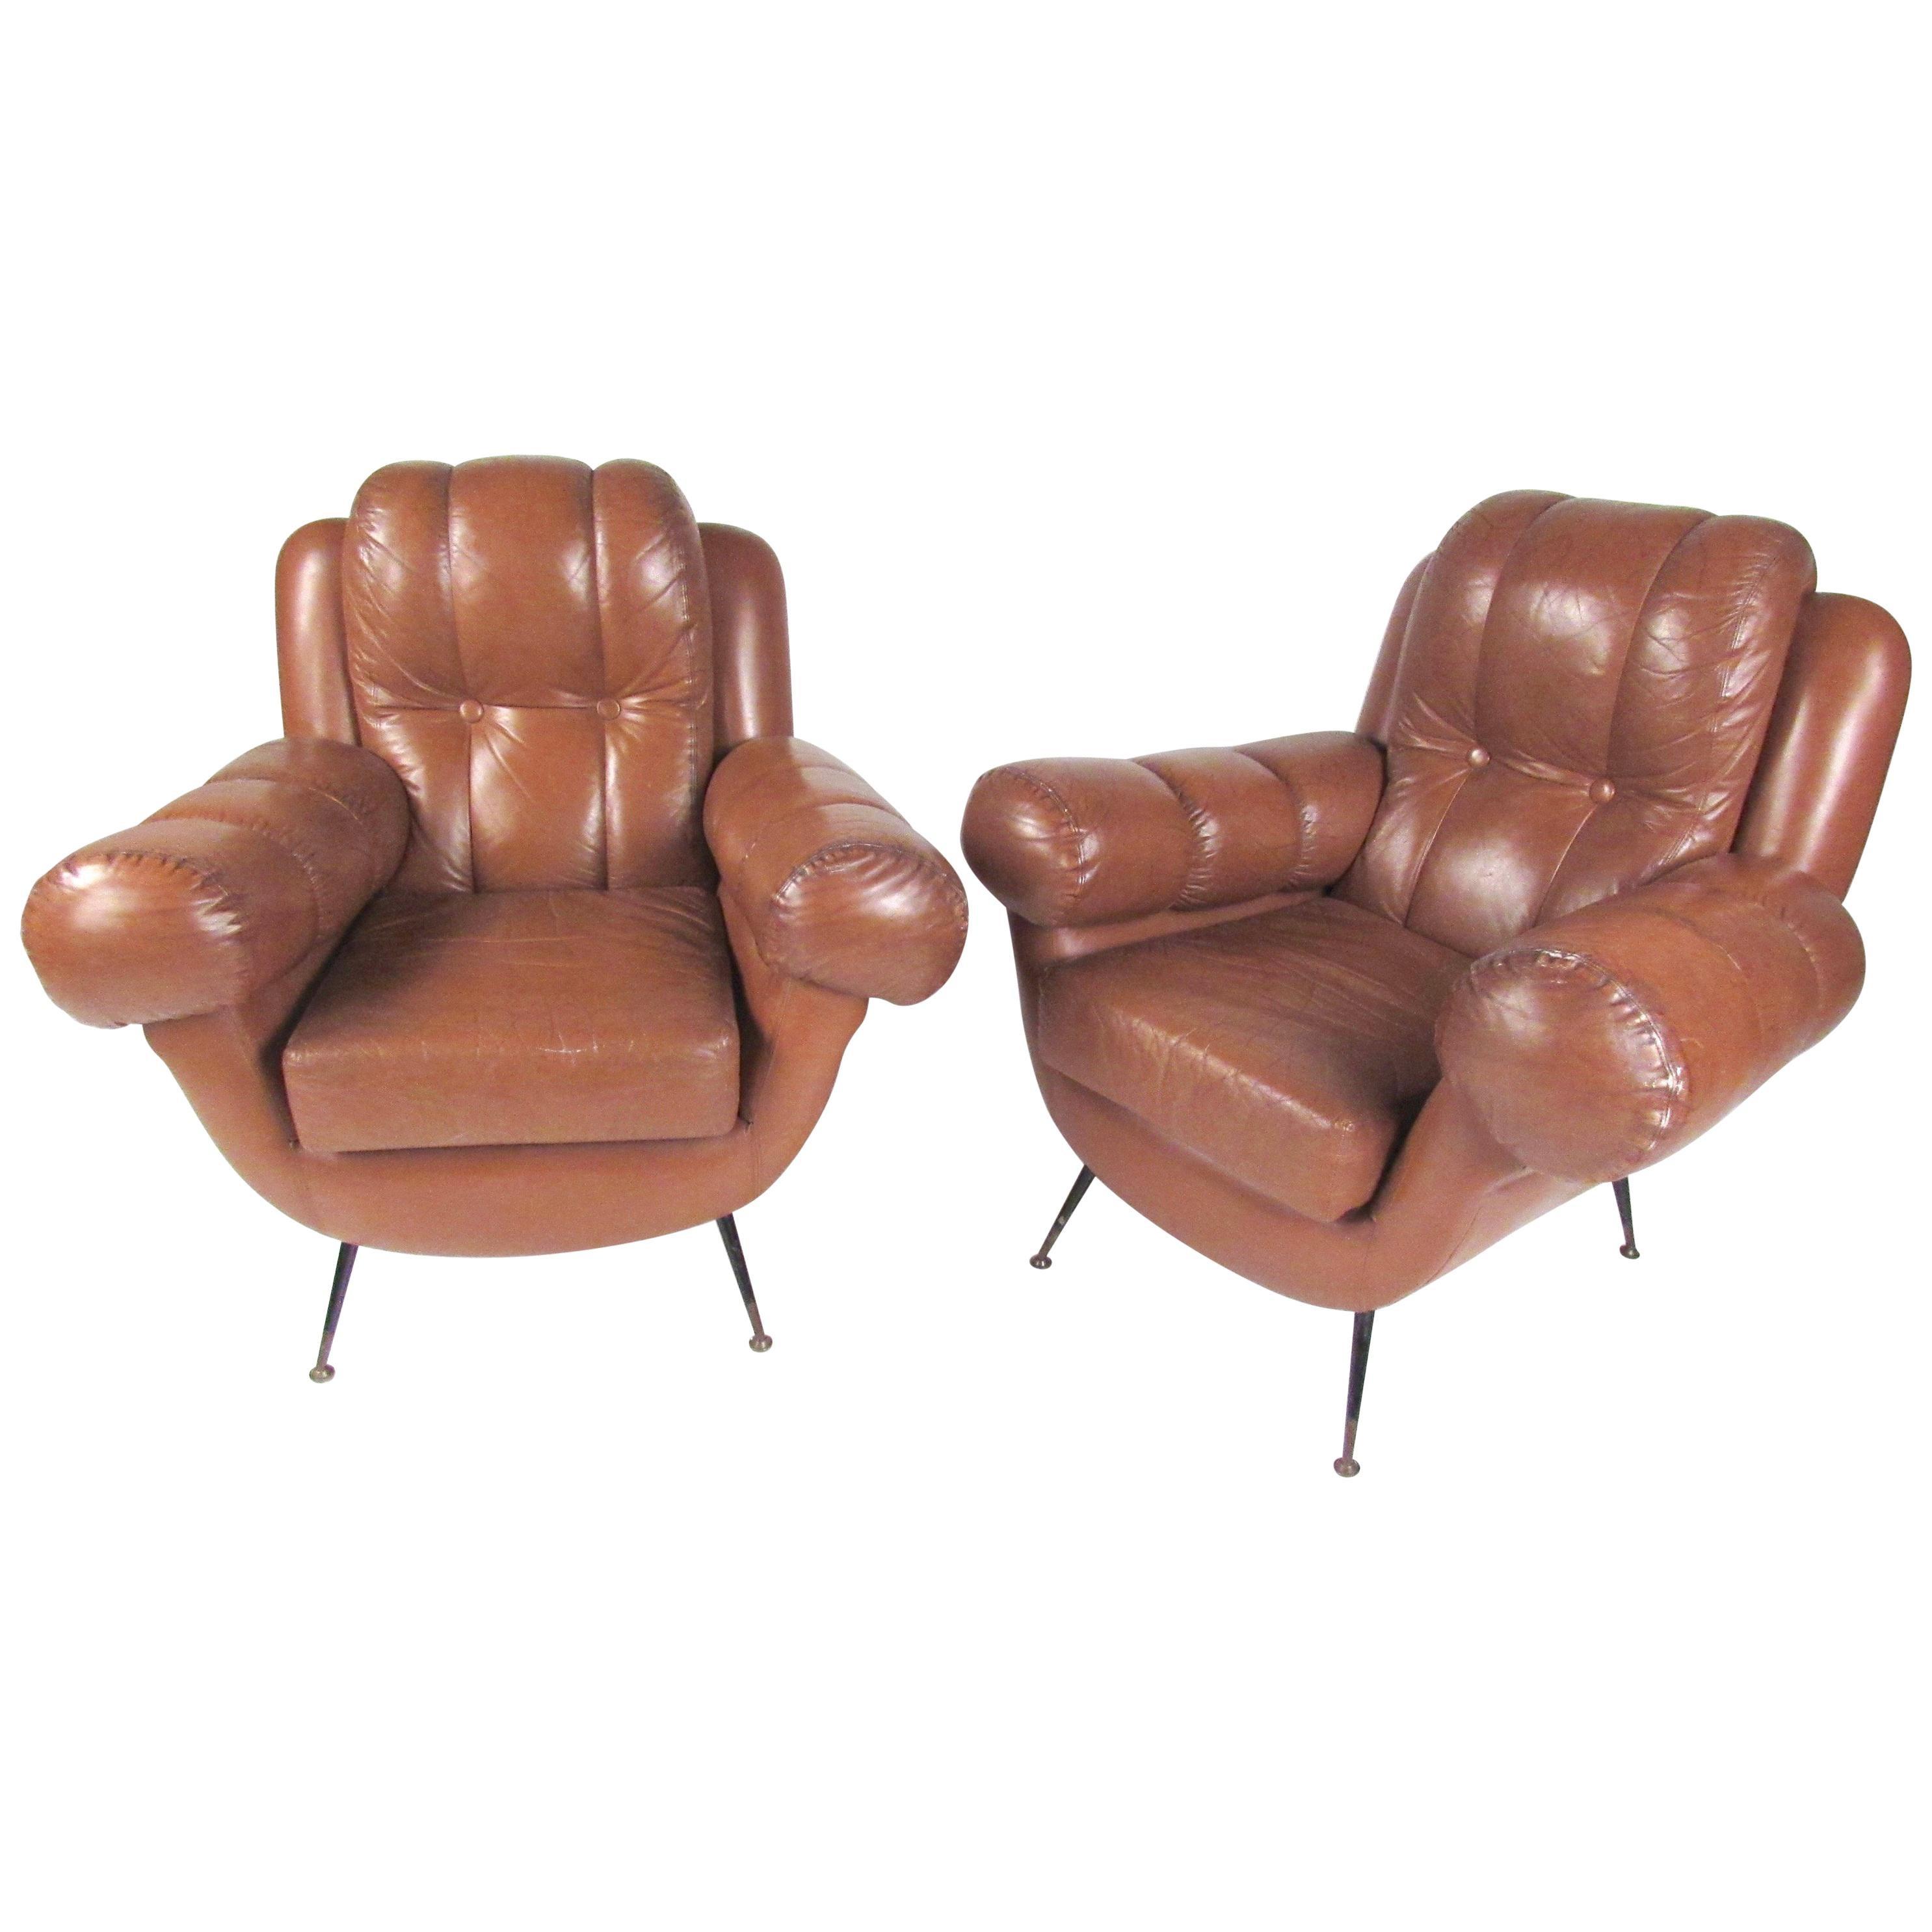 Pair Vintage Leather Club Chairs after Gigi Radice